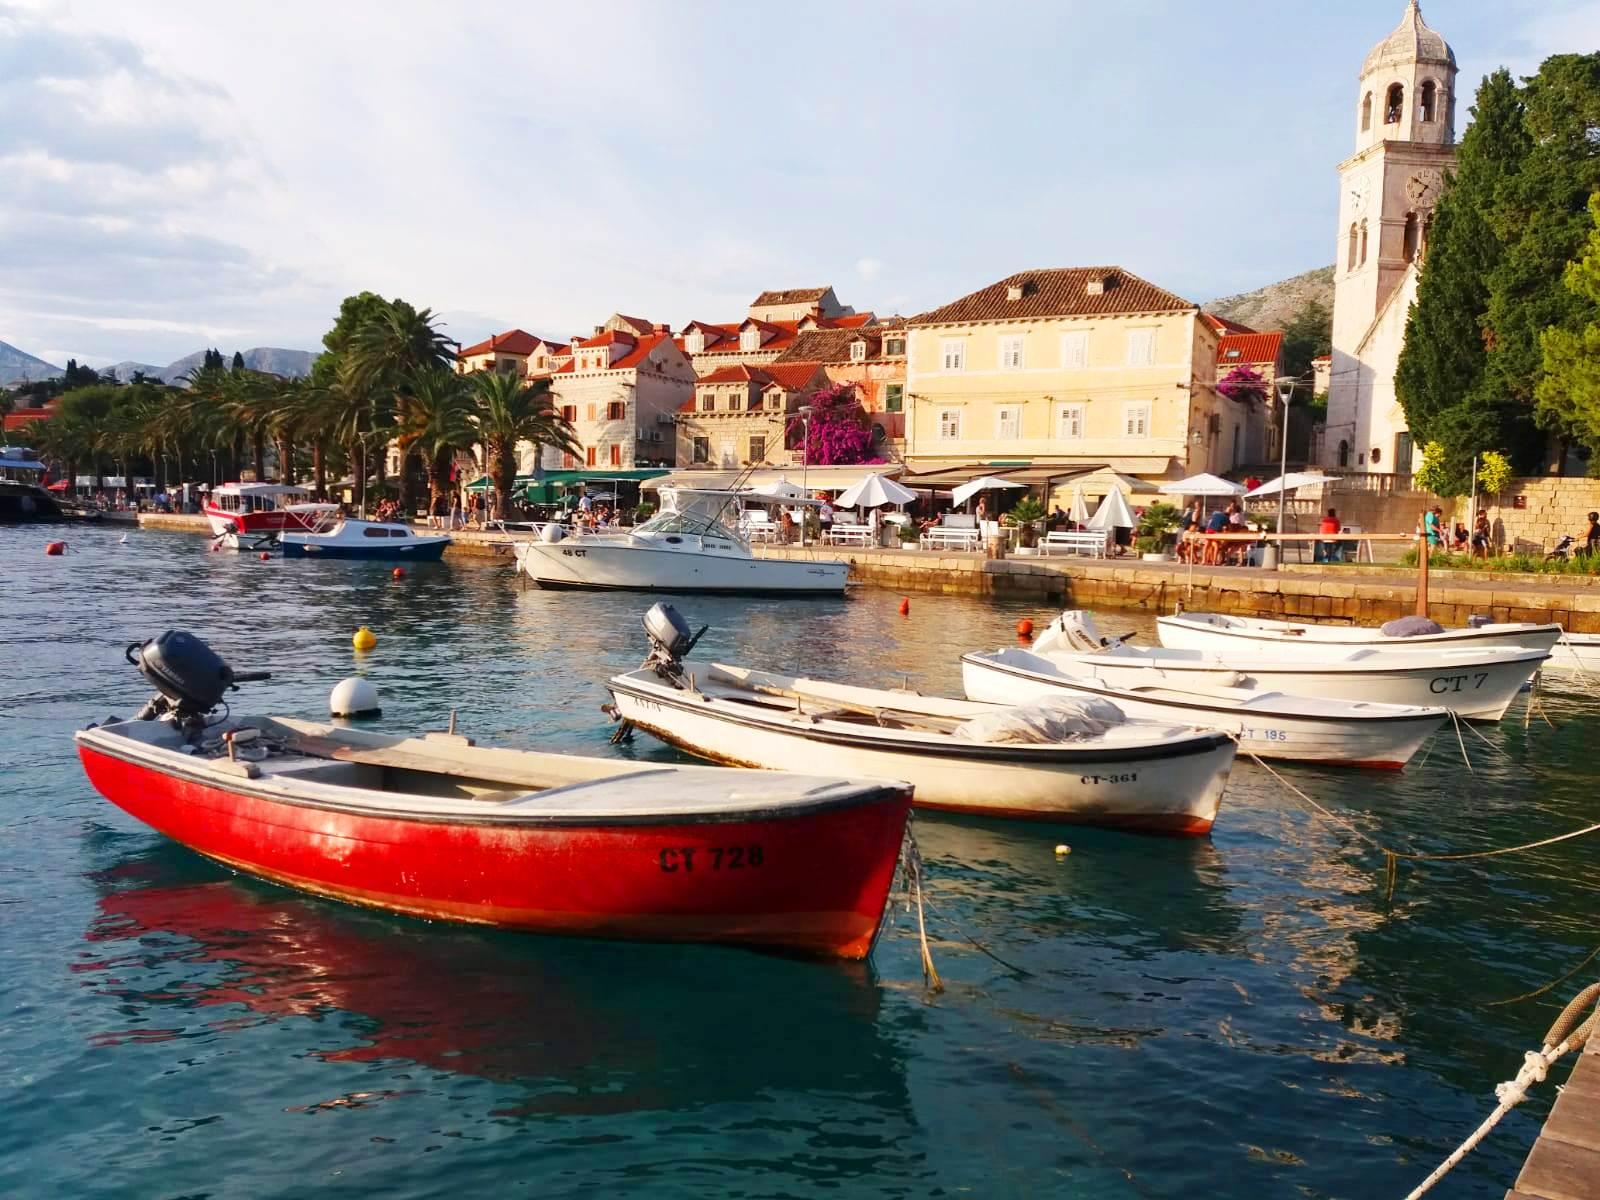 statiunea Cavtat din Croatia